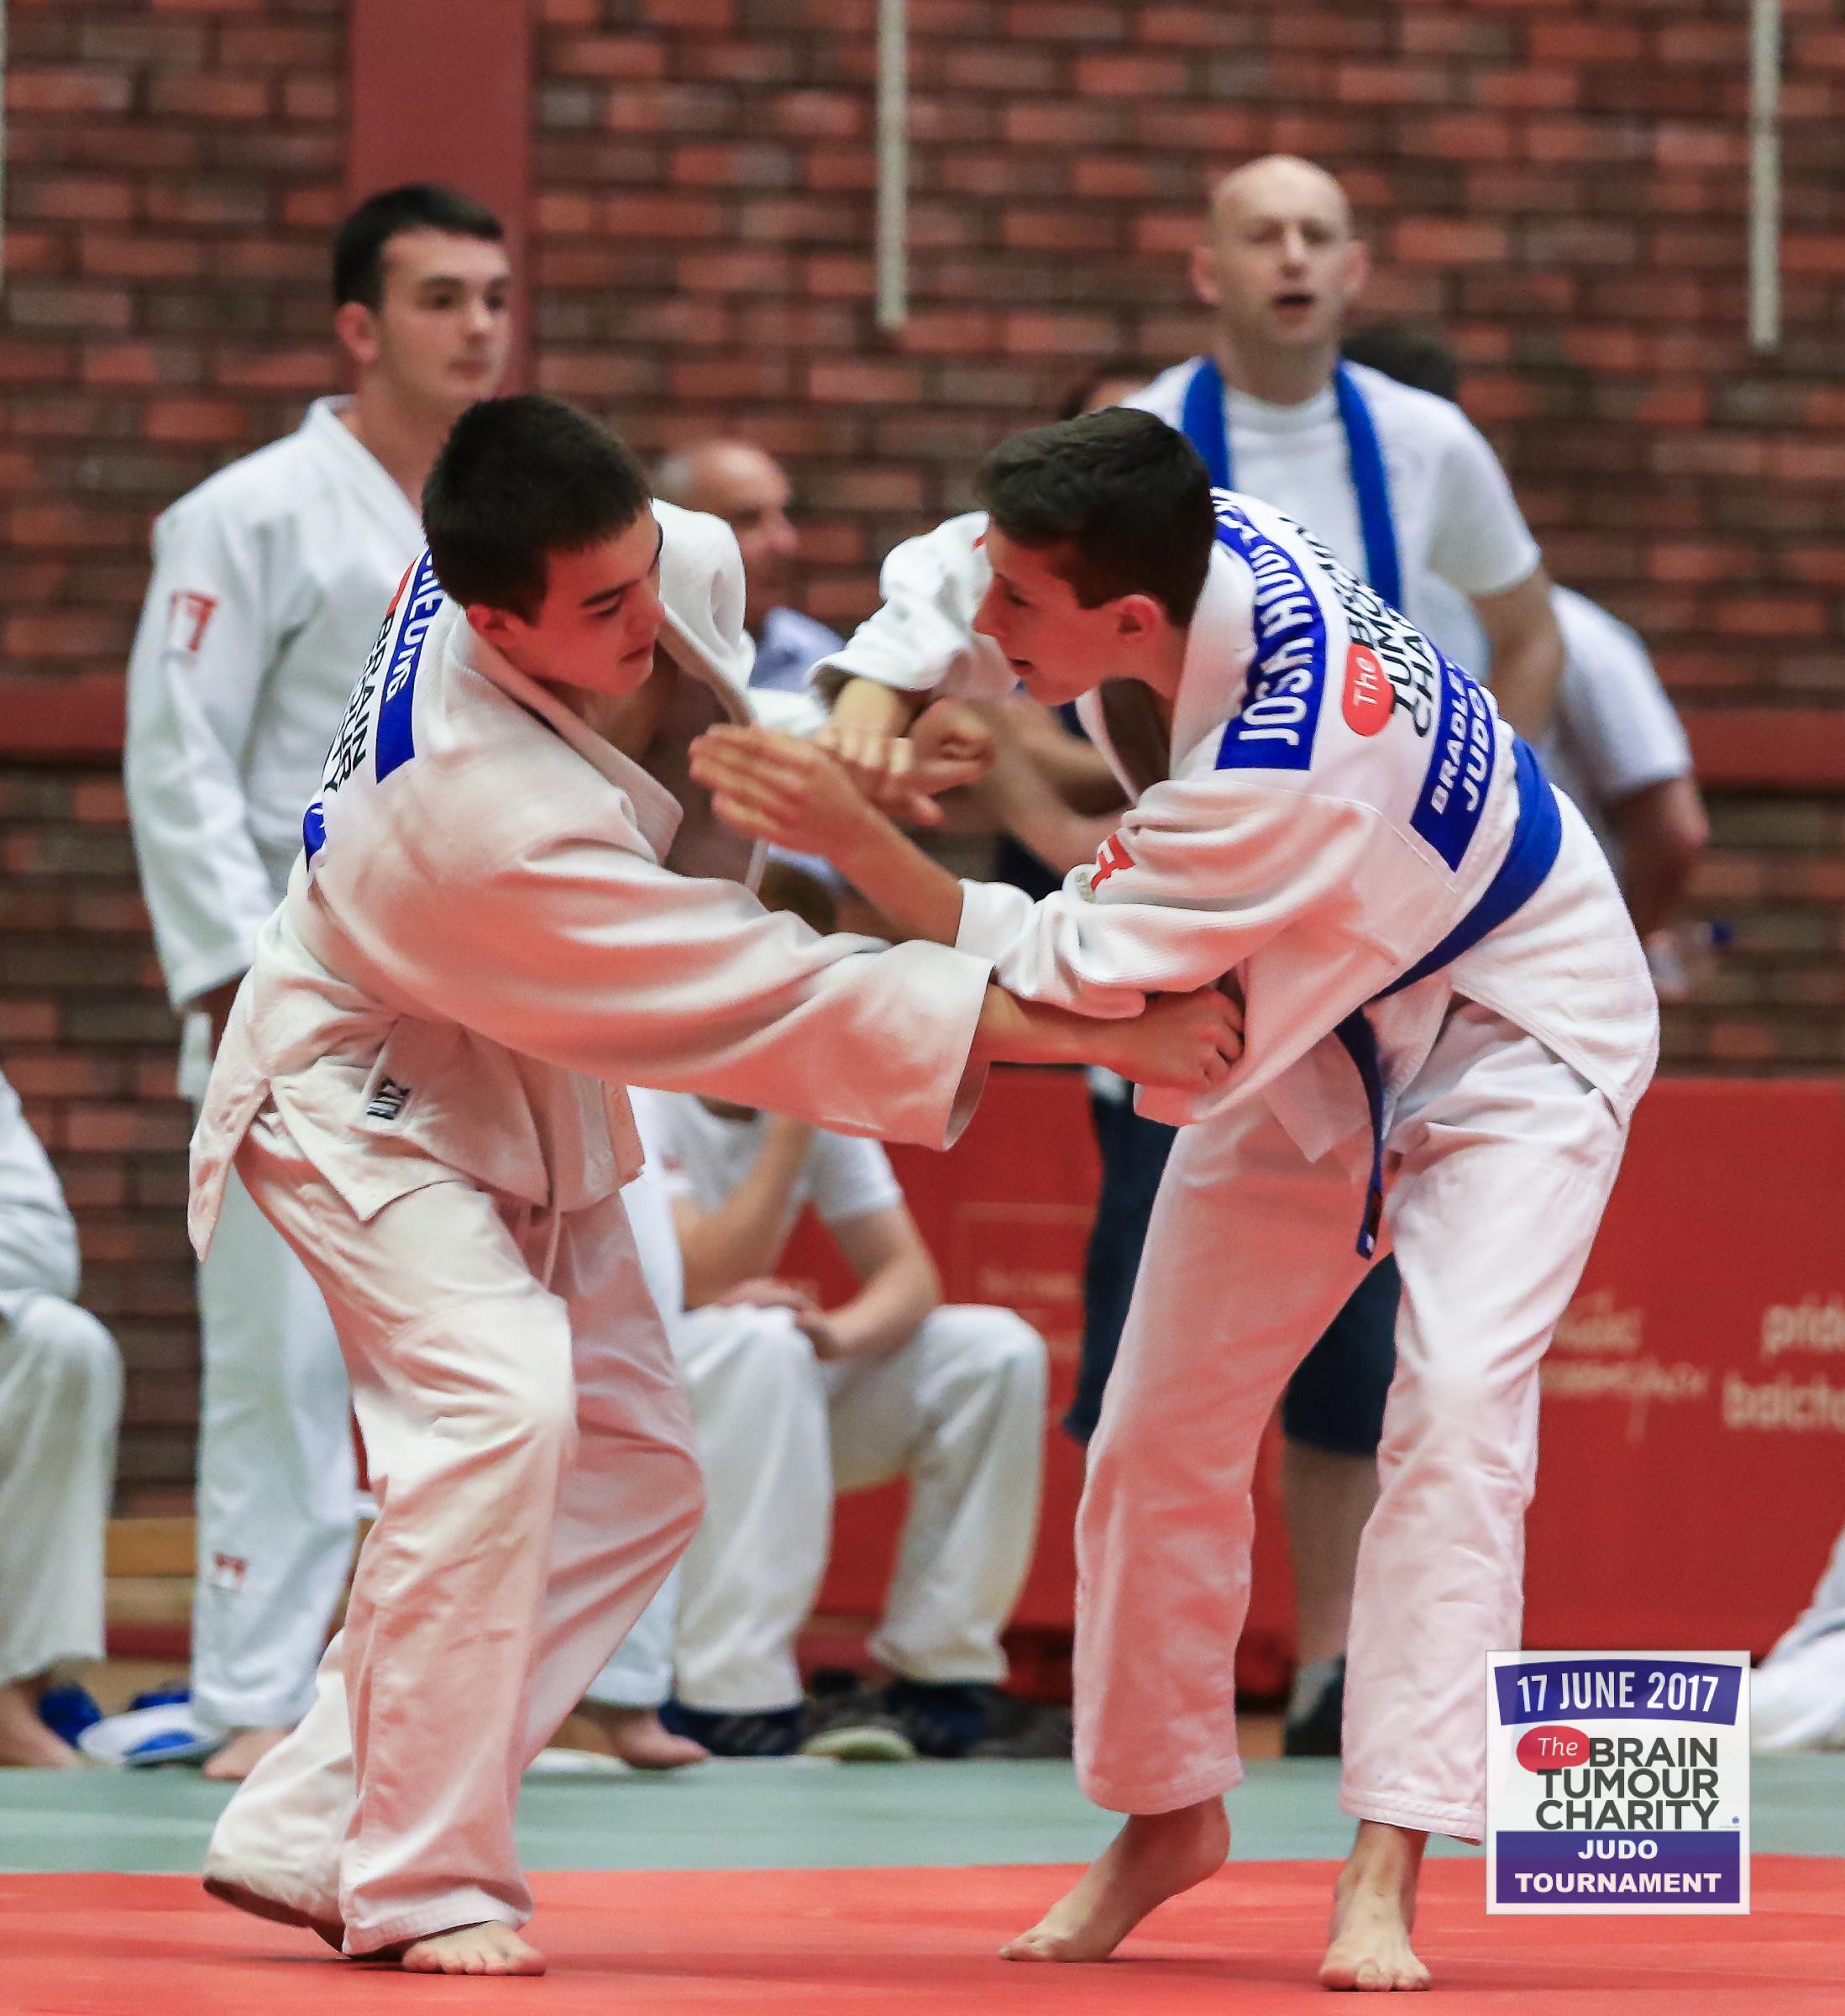 DM_0029_Charity_judo